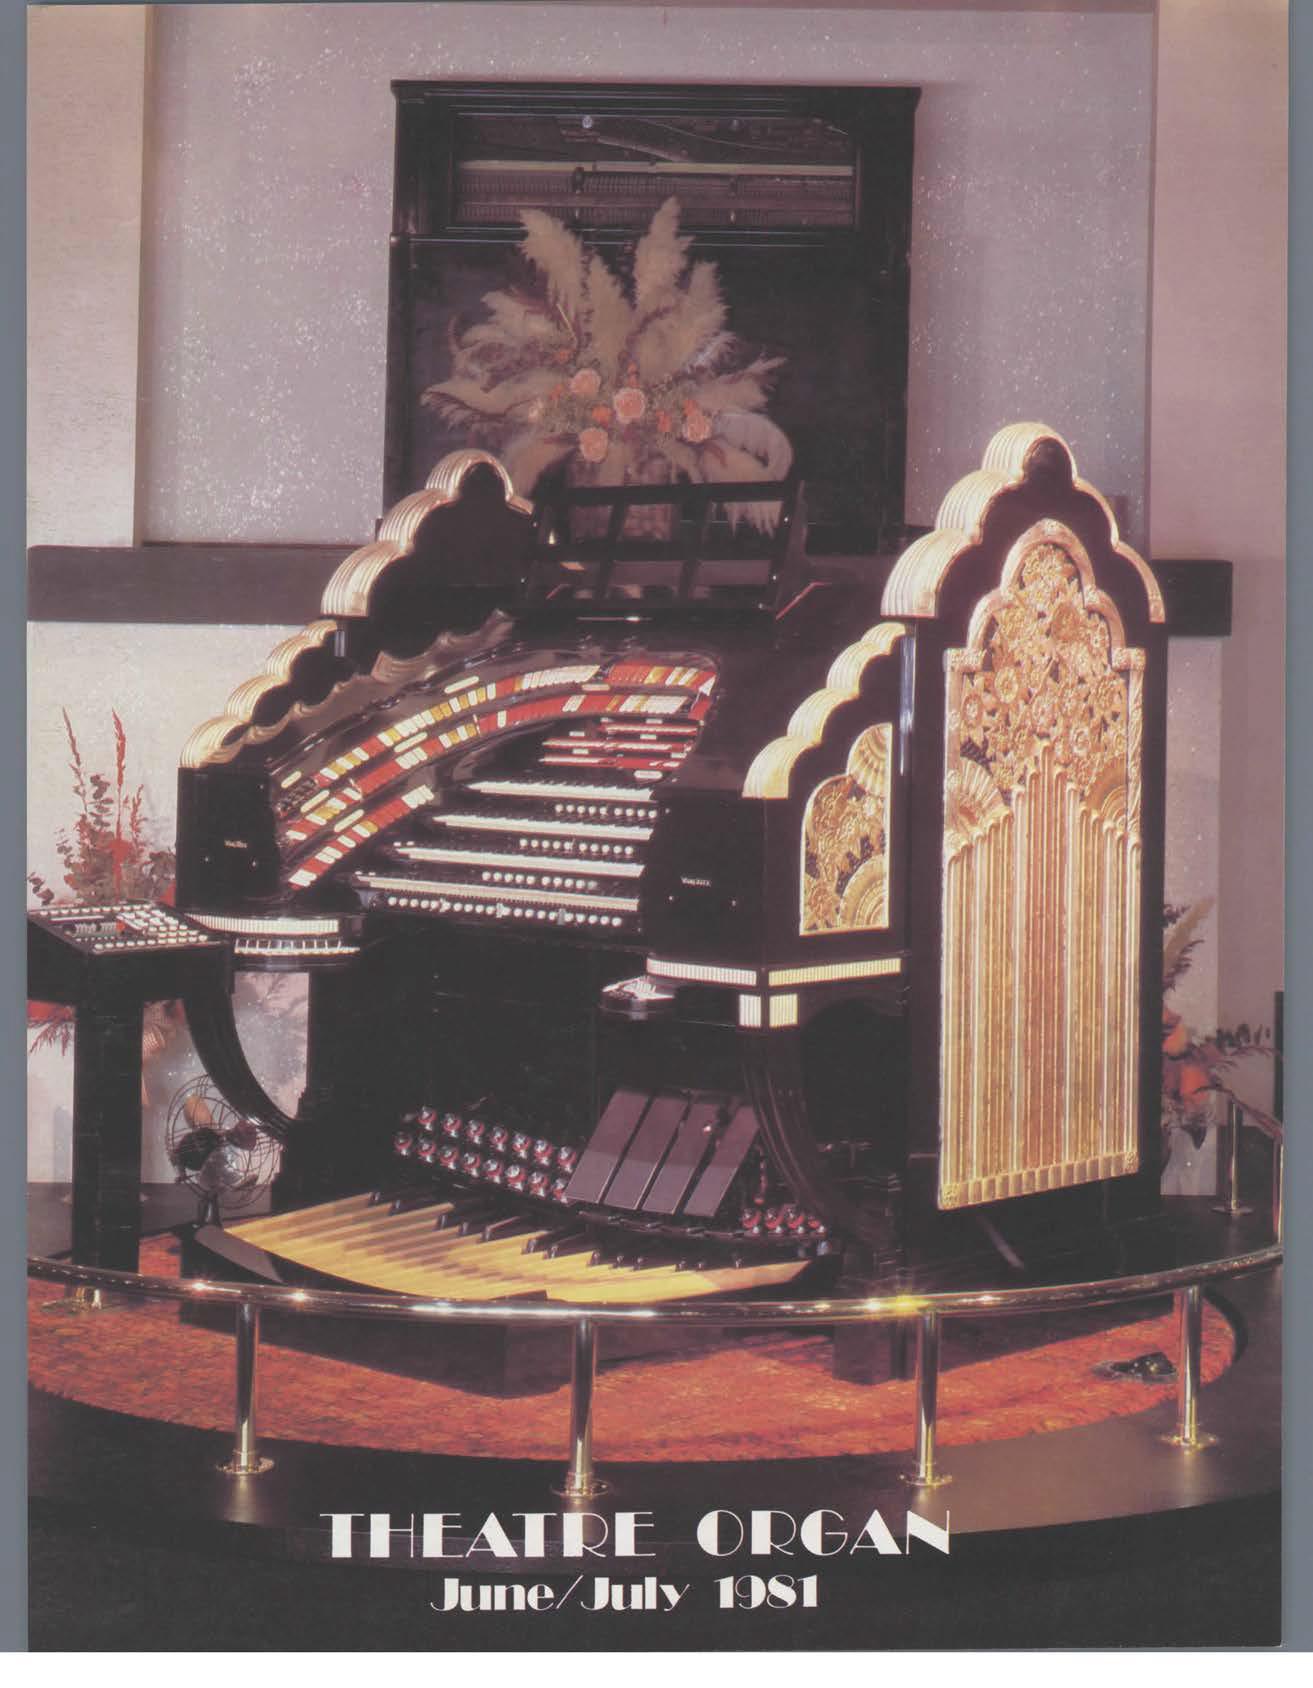 Theatre Organ, June - July 1981, Volume 23, Number 3